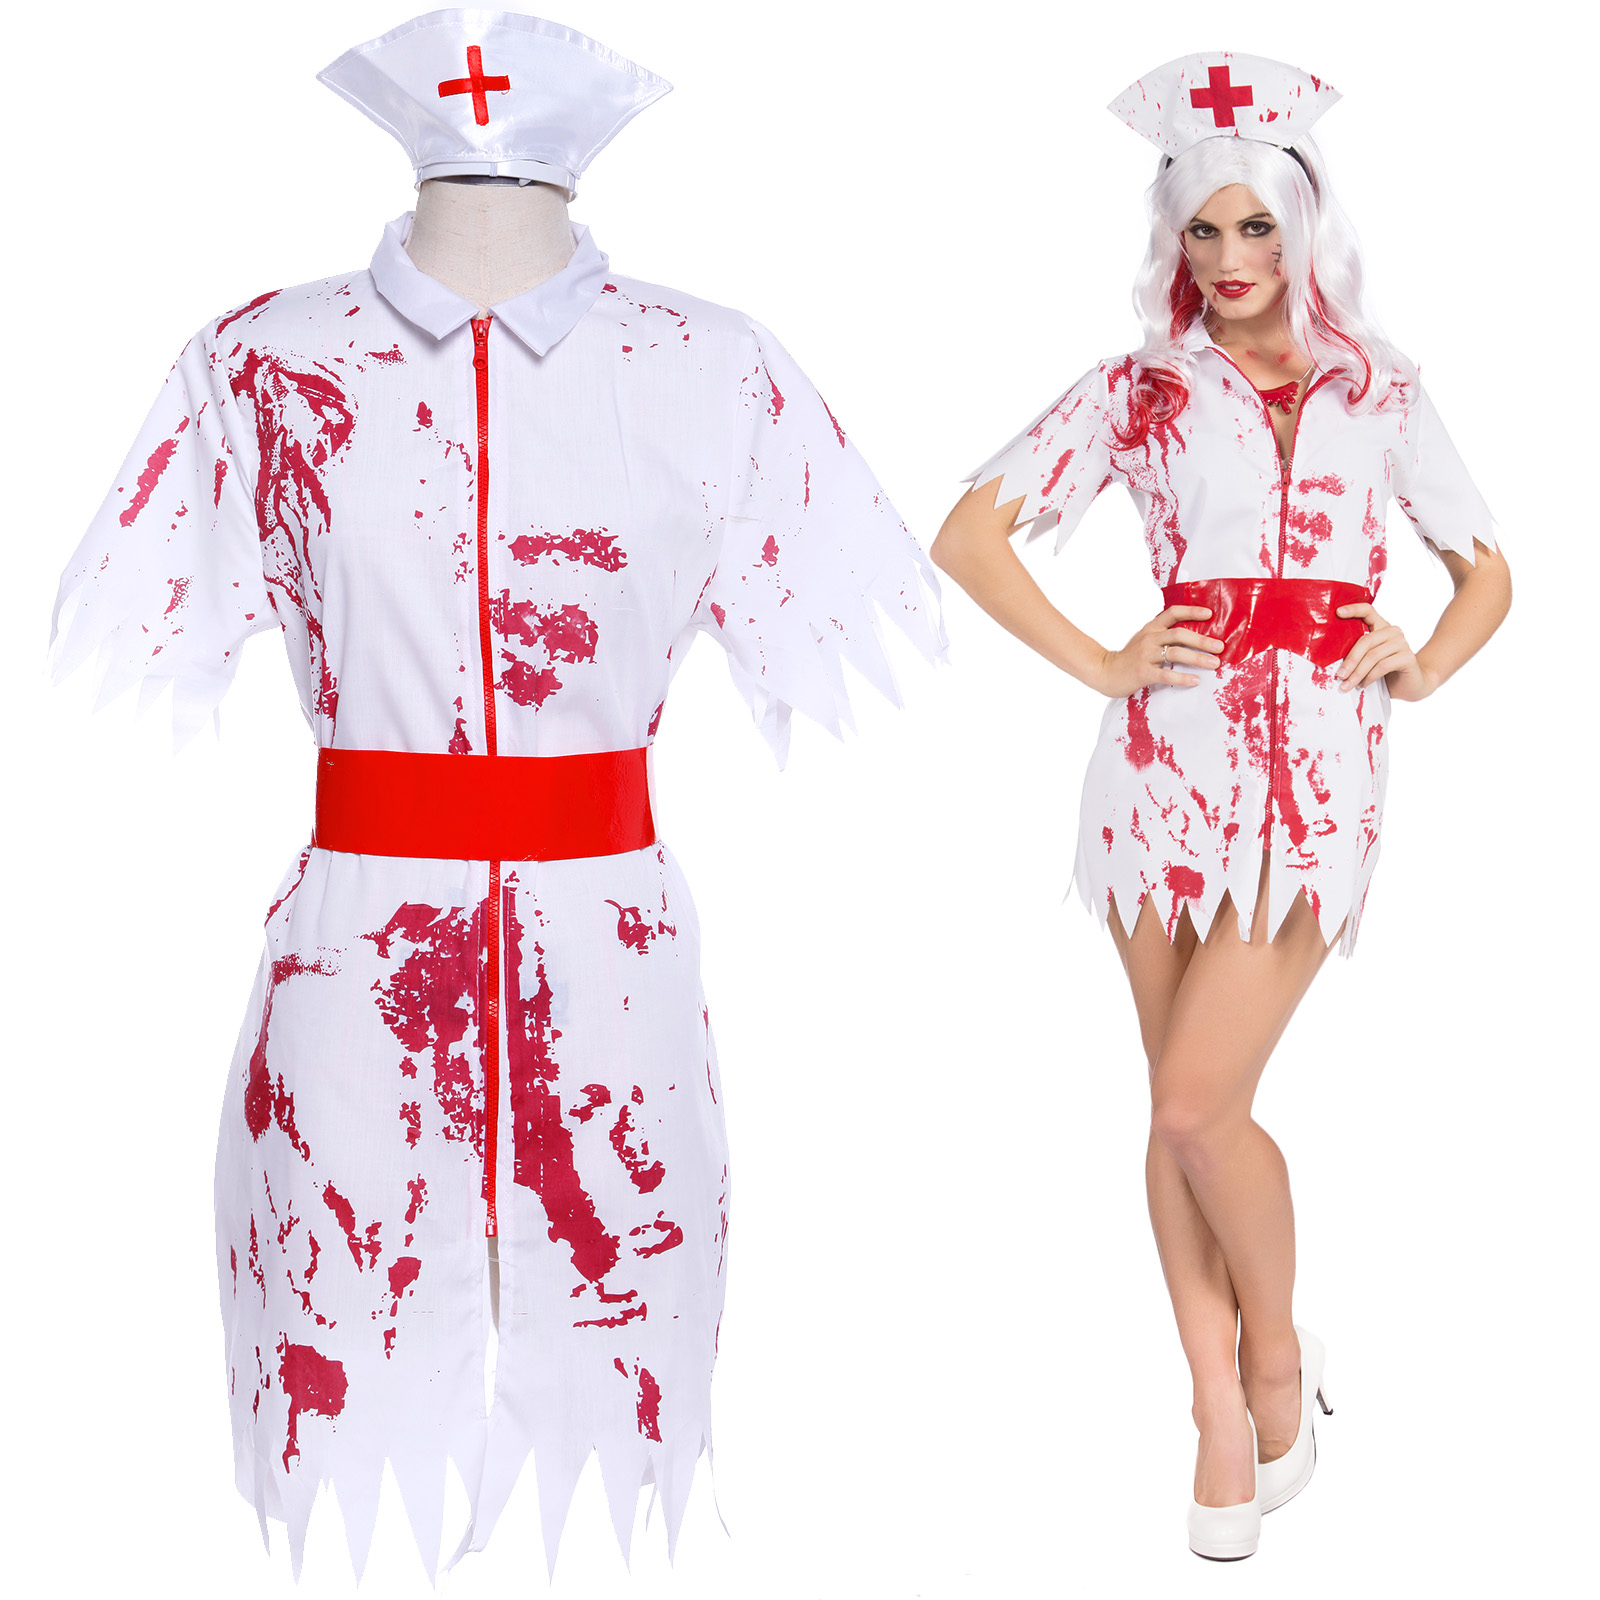 NEW Bloodthirsty Zombie Nurse Living Dead Ladies Halloween Fancy Dress Costume